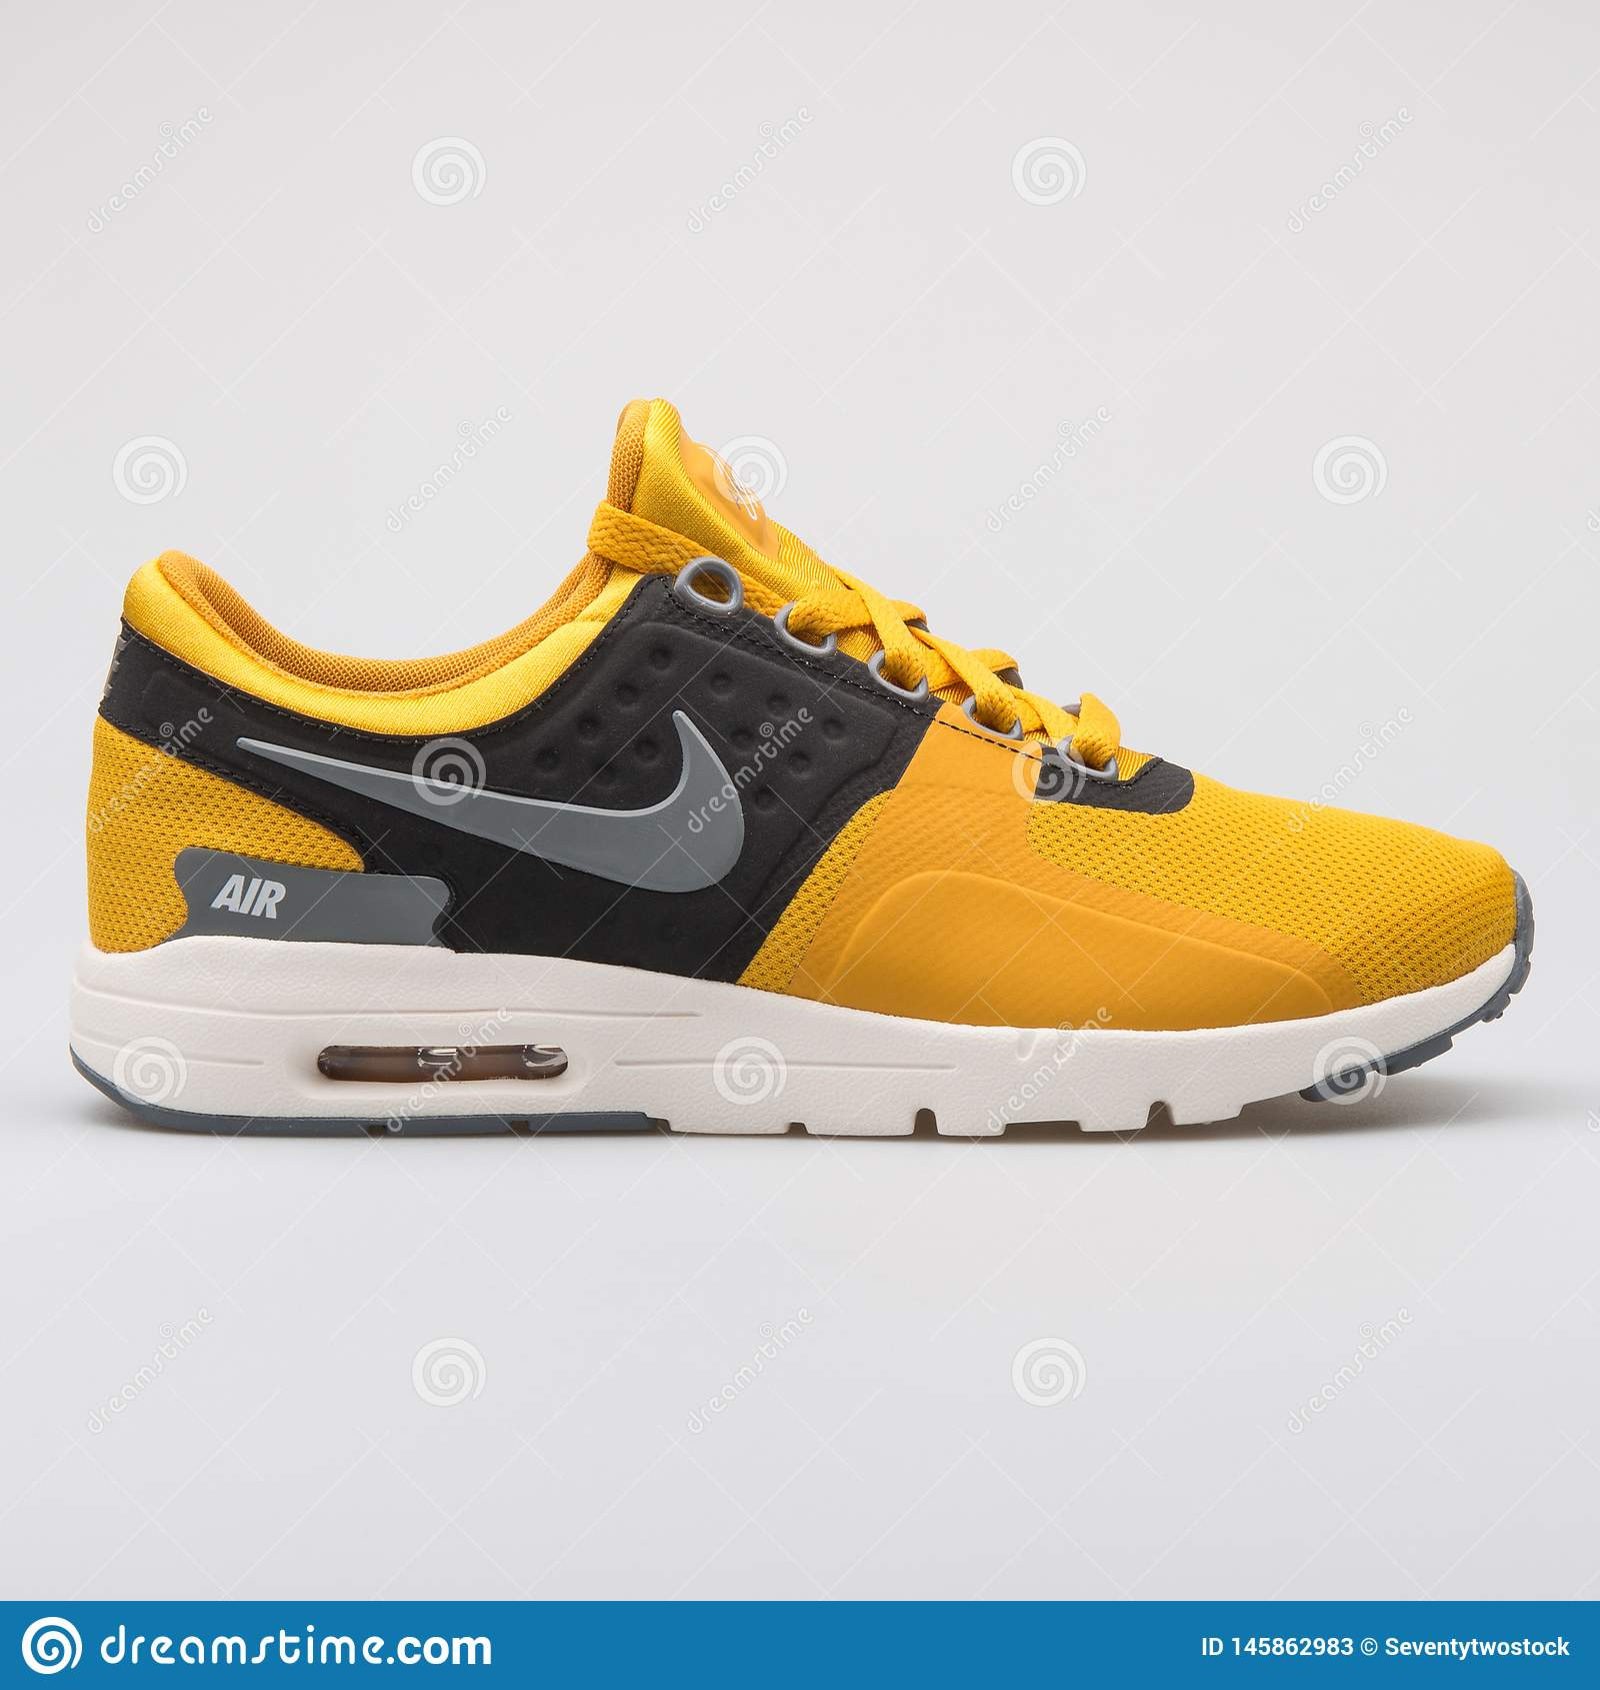 Nike Air Max Zero Yellow And Black